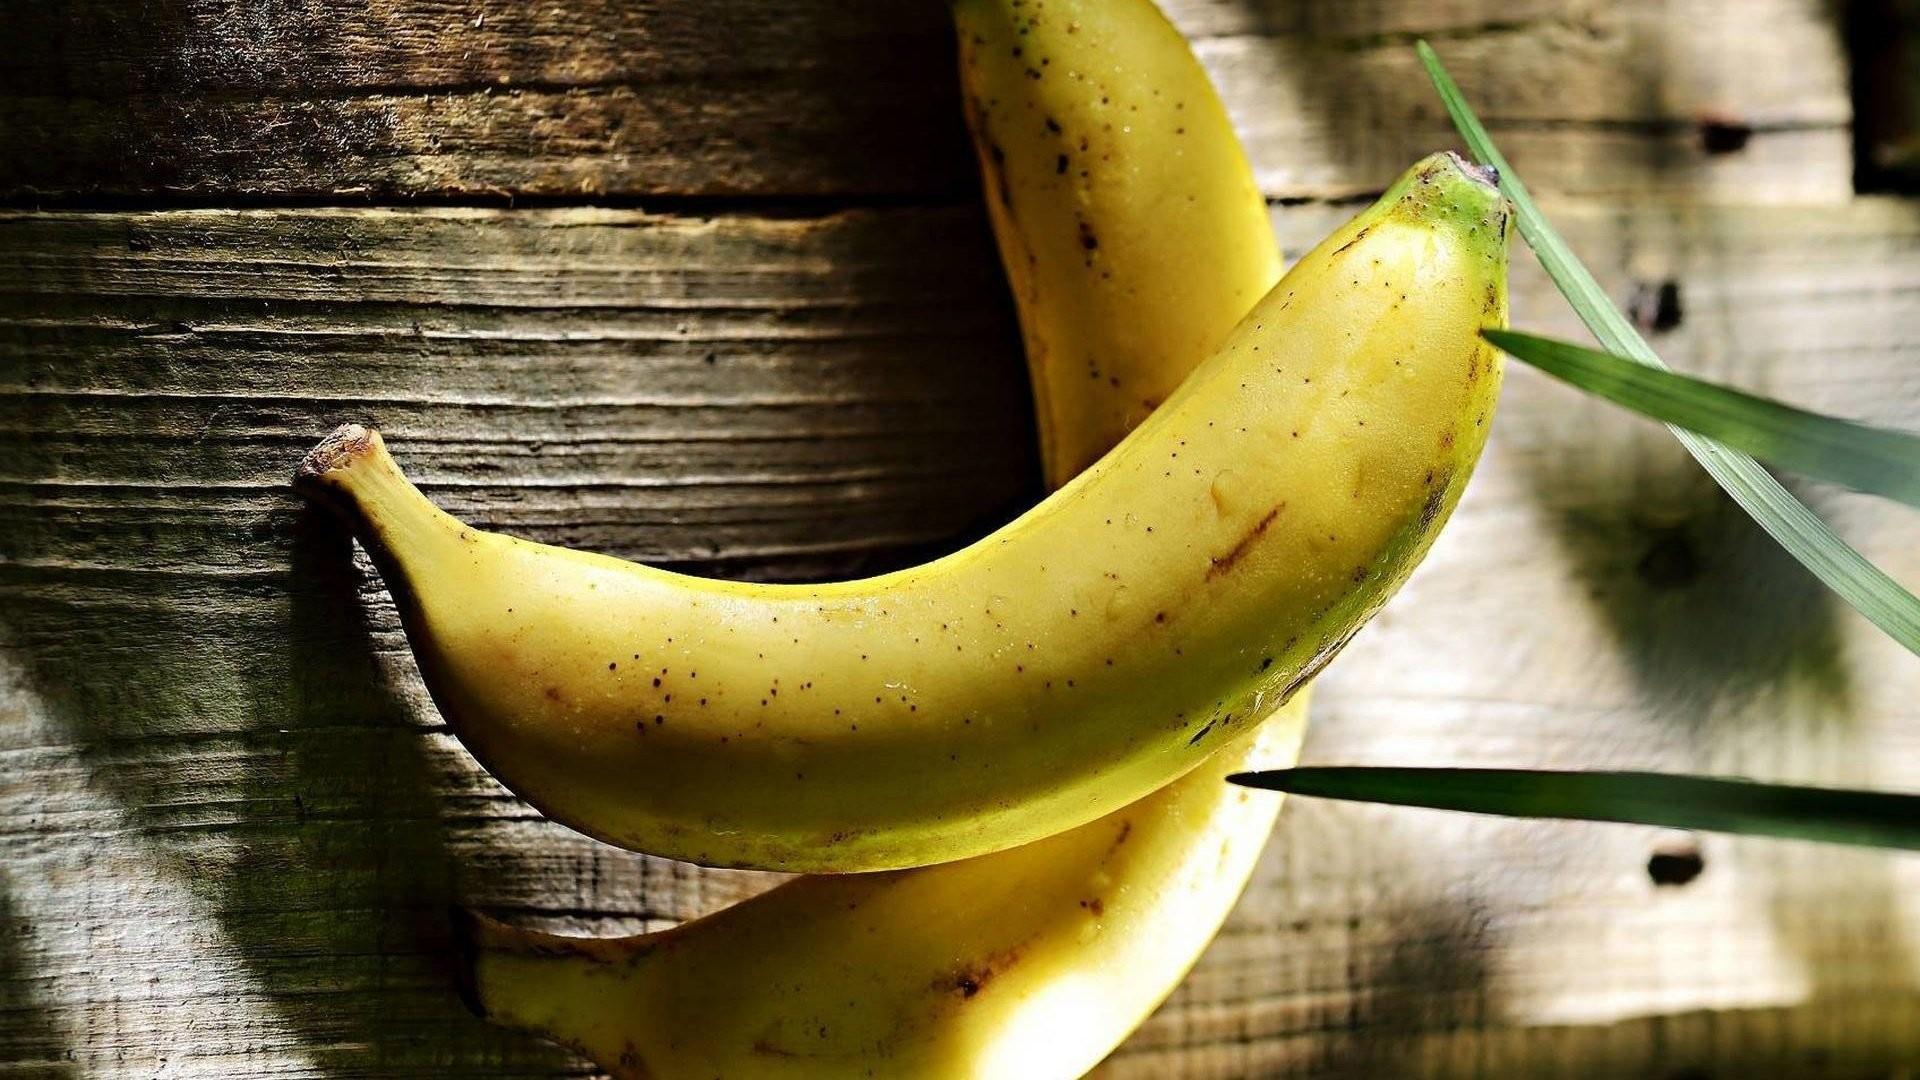 Banana Background